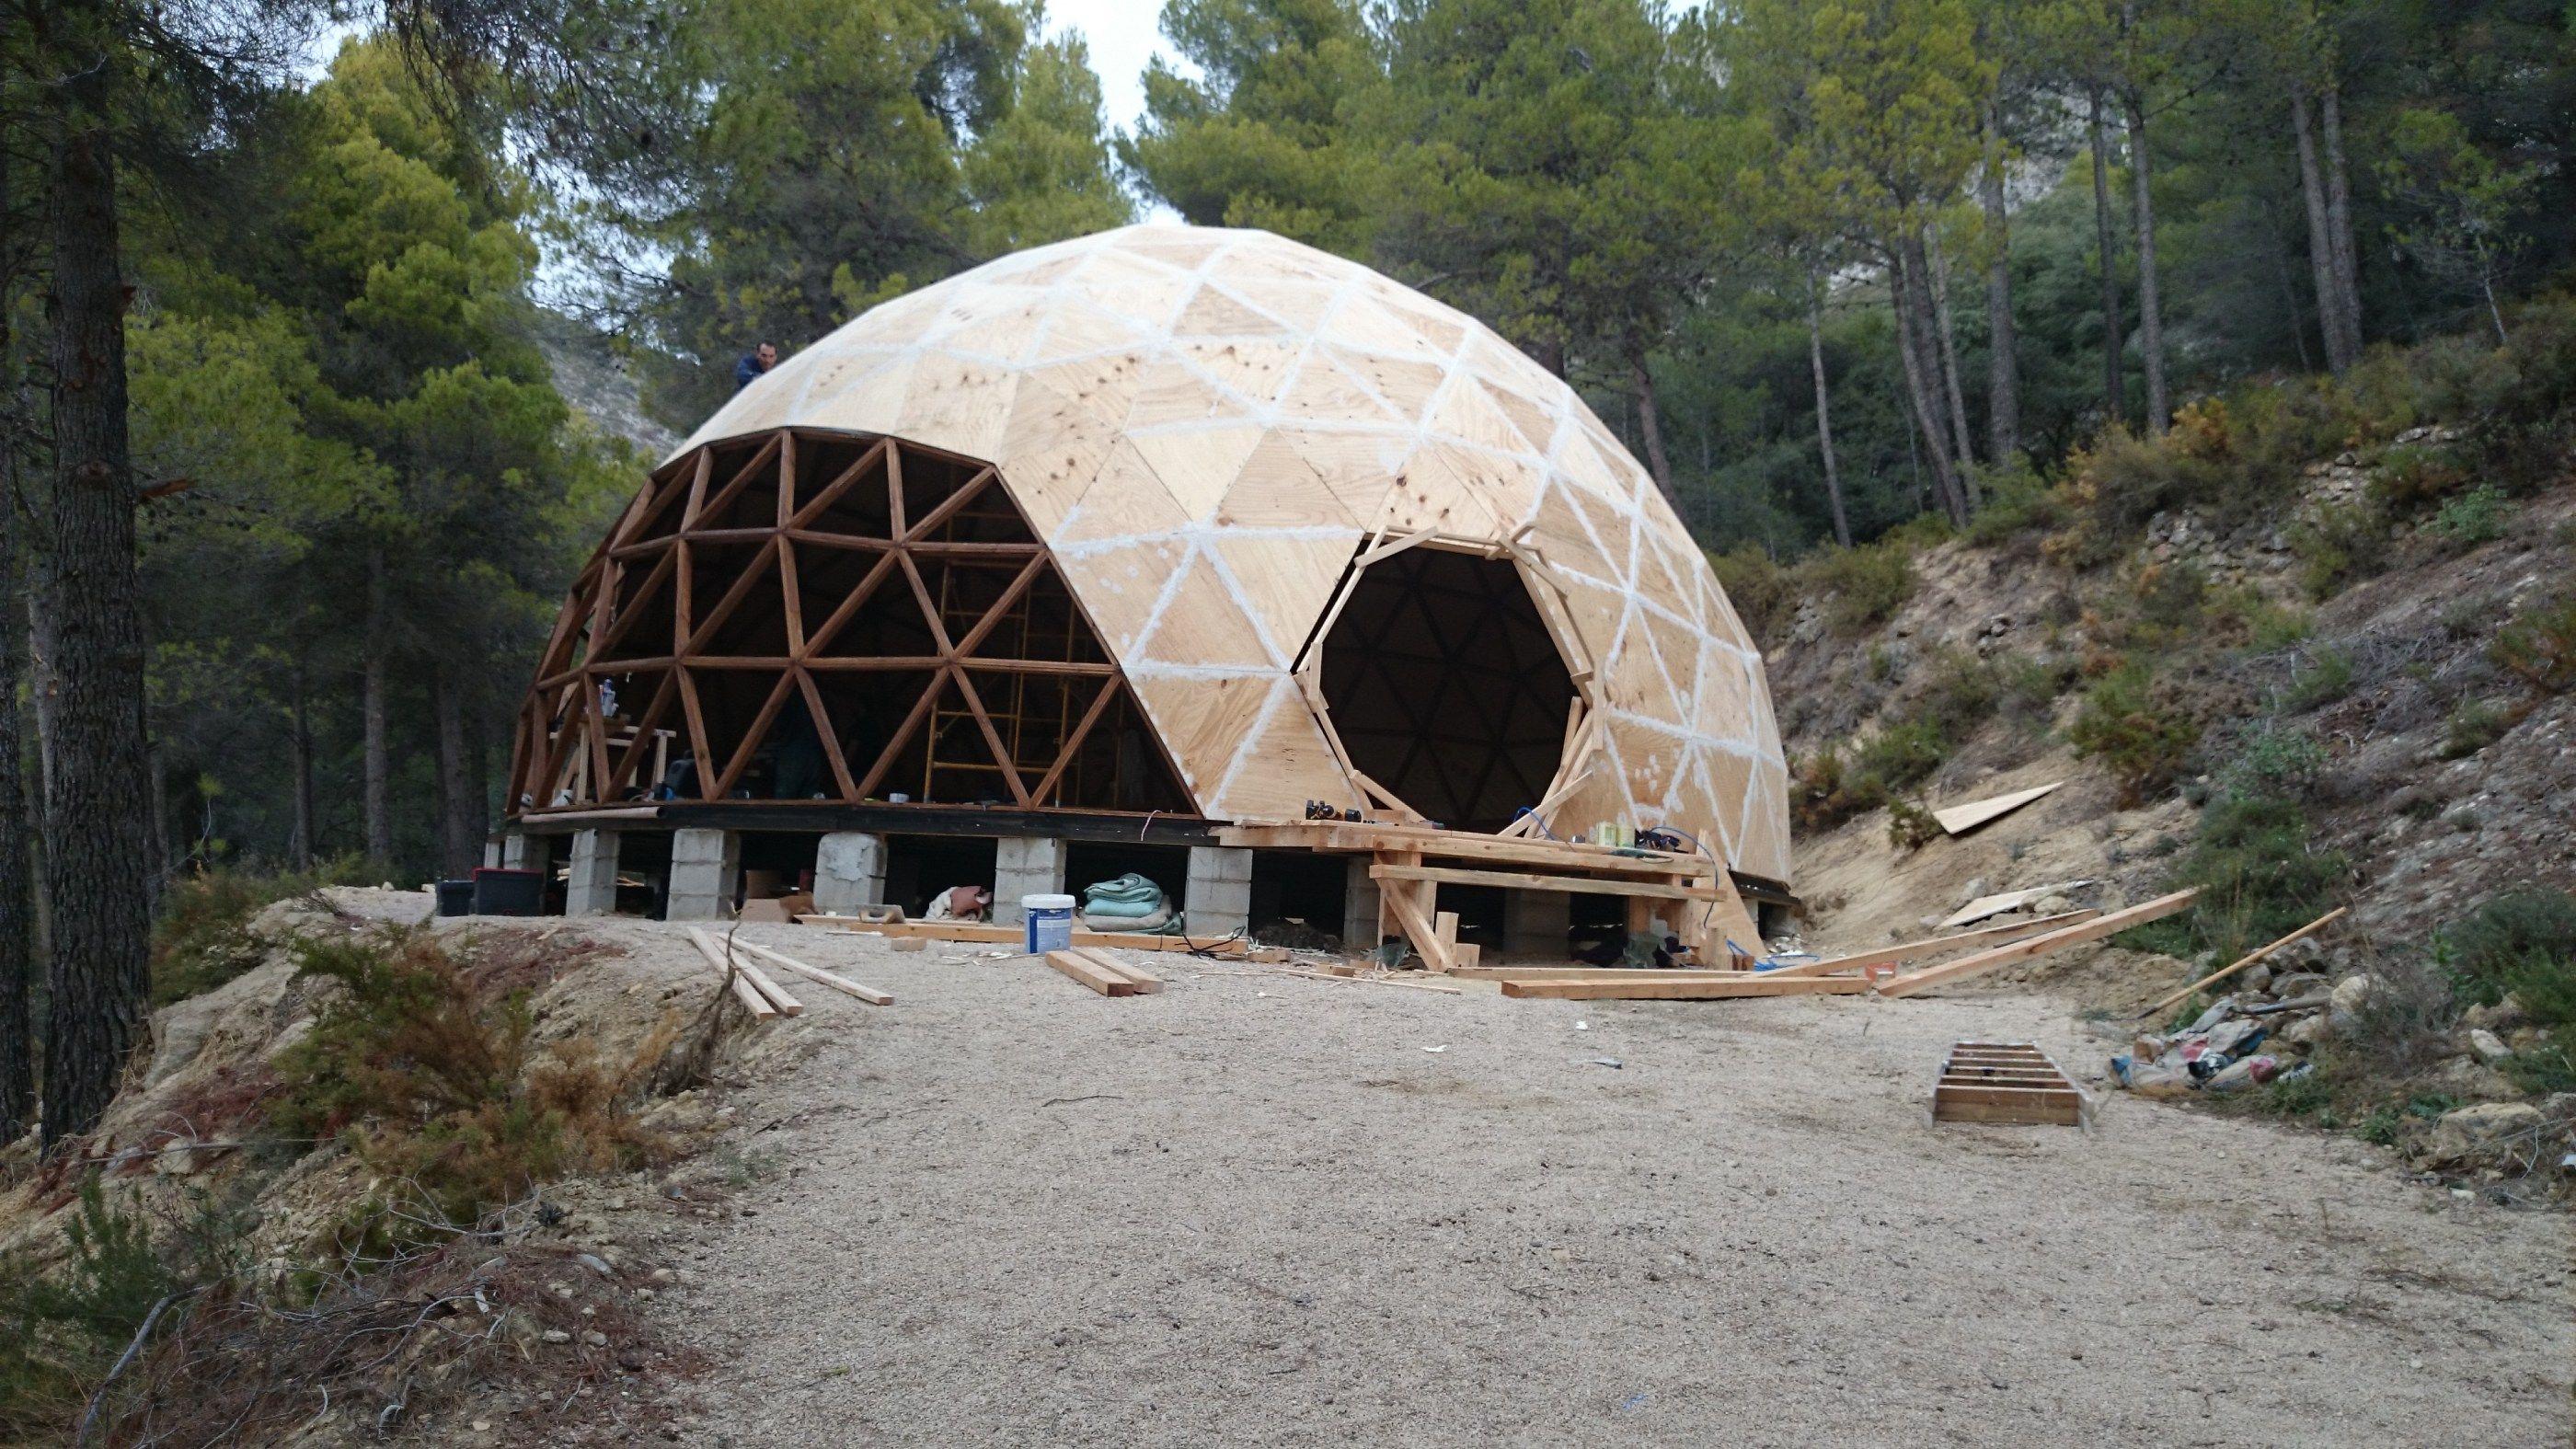 domo geod sico alicante domos geod sicos geodesics domes domos pinterest. Black Bedroom Furniture Sets. Home Design Ideas